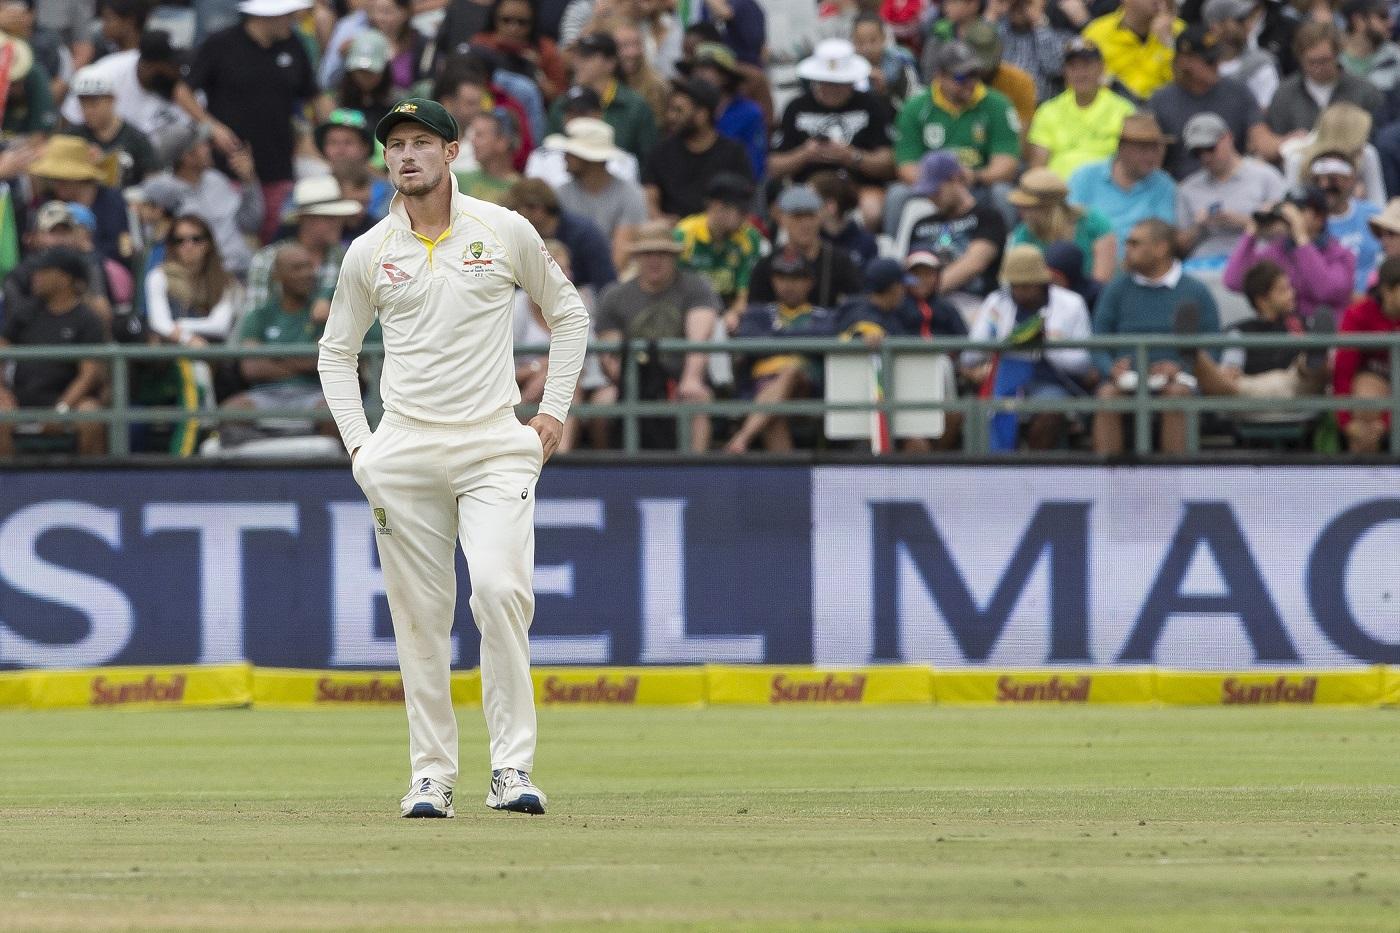 Australian Prime Minister Calls for End of Sledging in Cricket 1